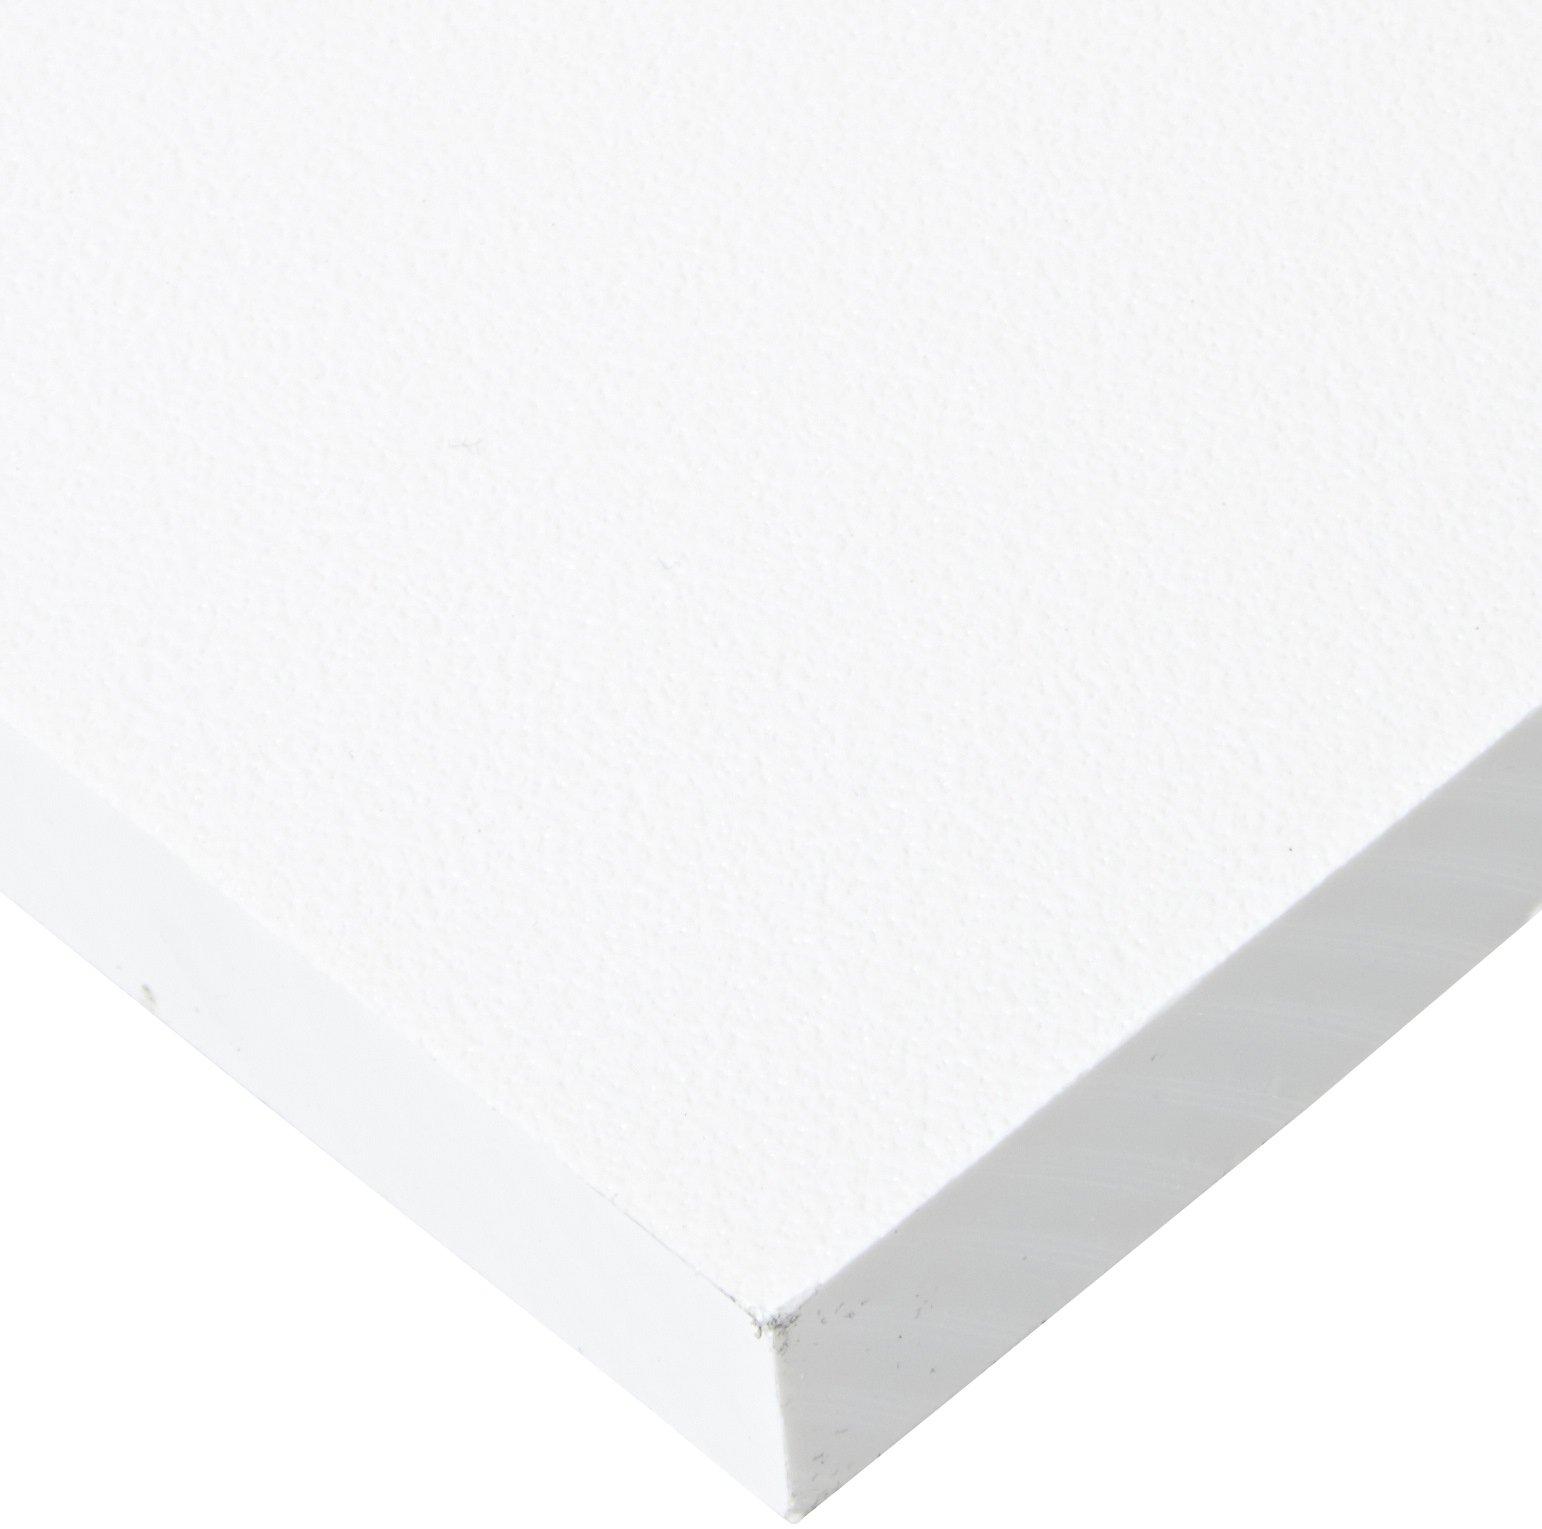 "Plate .250/"" x 24/"" x 24/"" Gray Color PVC Sheet Plastic Polyvinyl Chloride Panel"